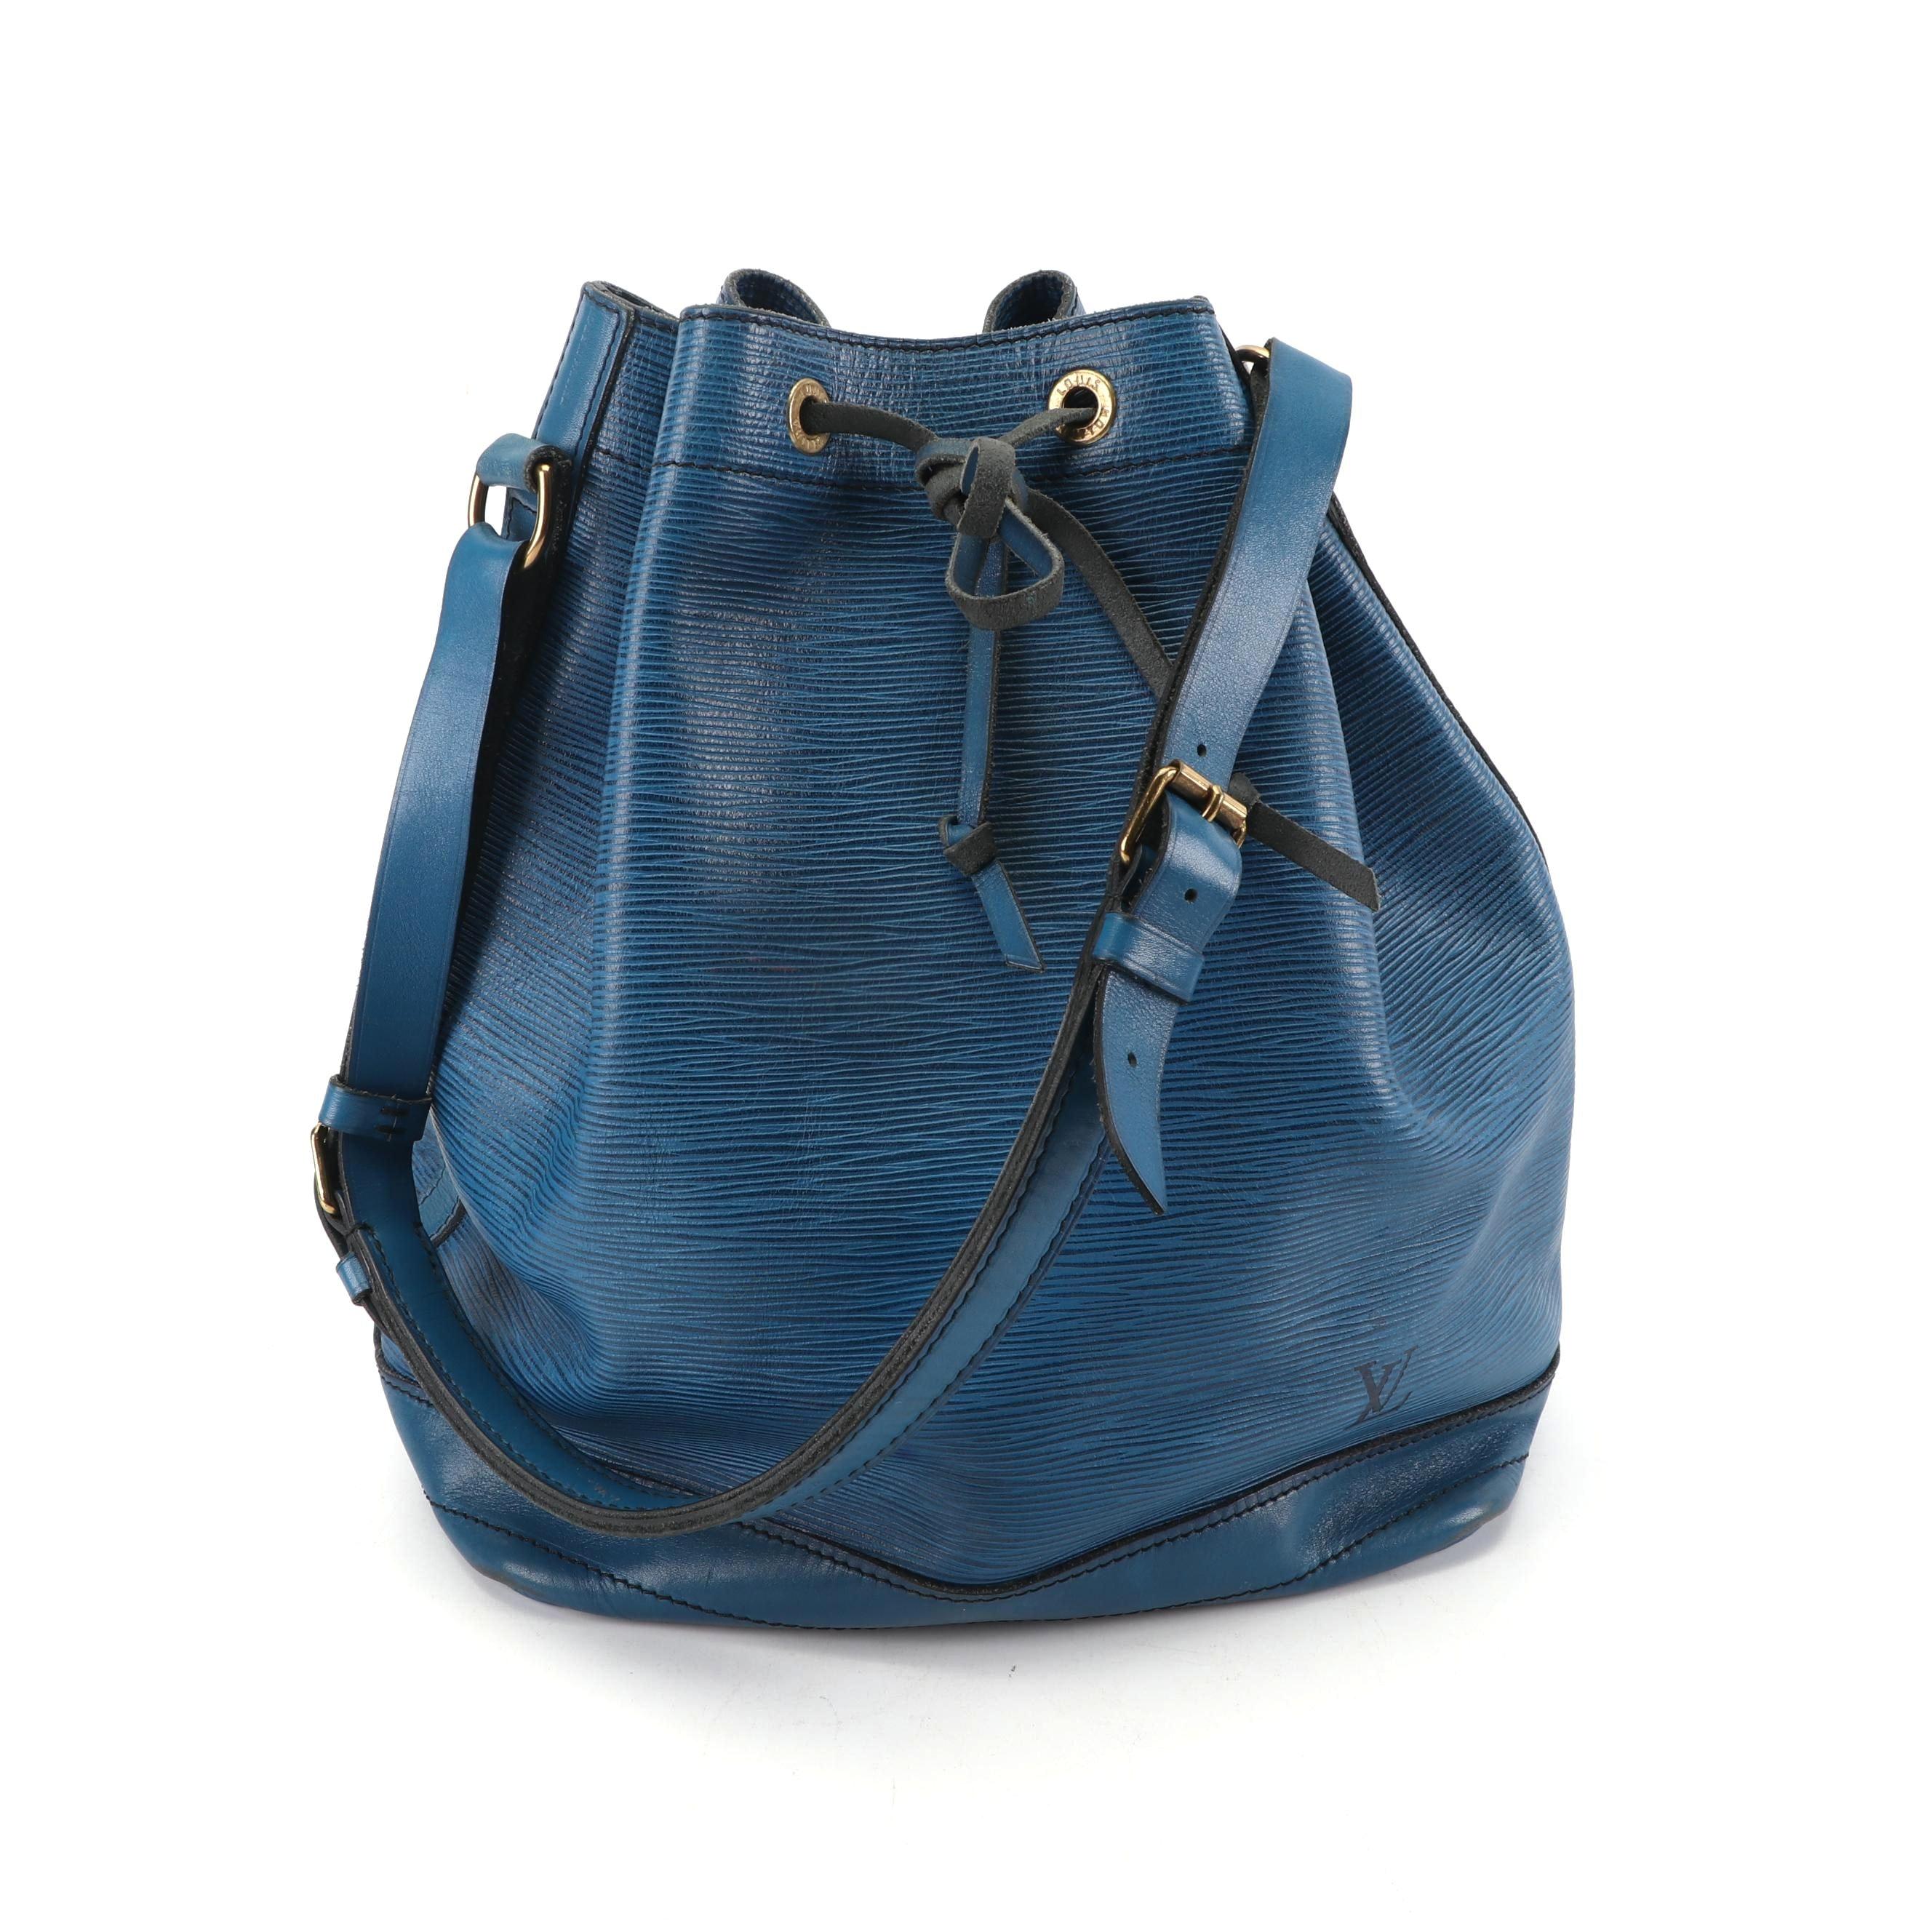 1986 Vintage Louis Vuitton of Paris Cyan Epi Leather Noe Bucket Bag